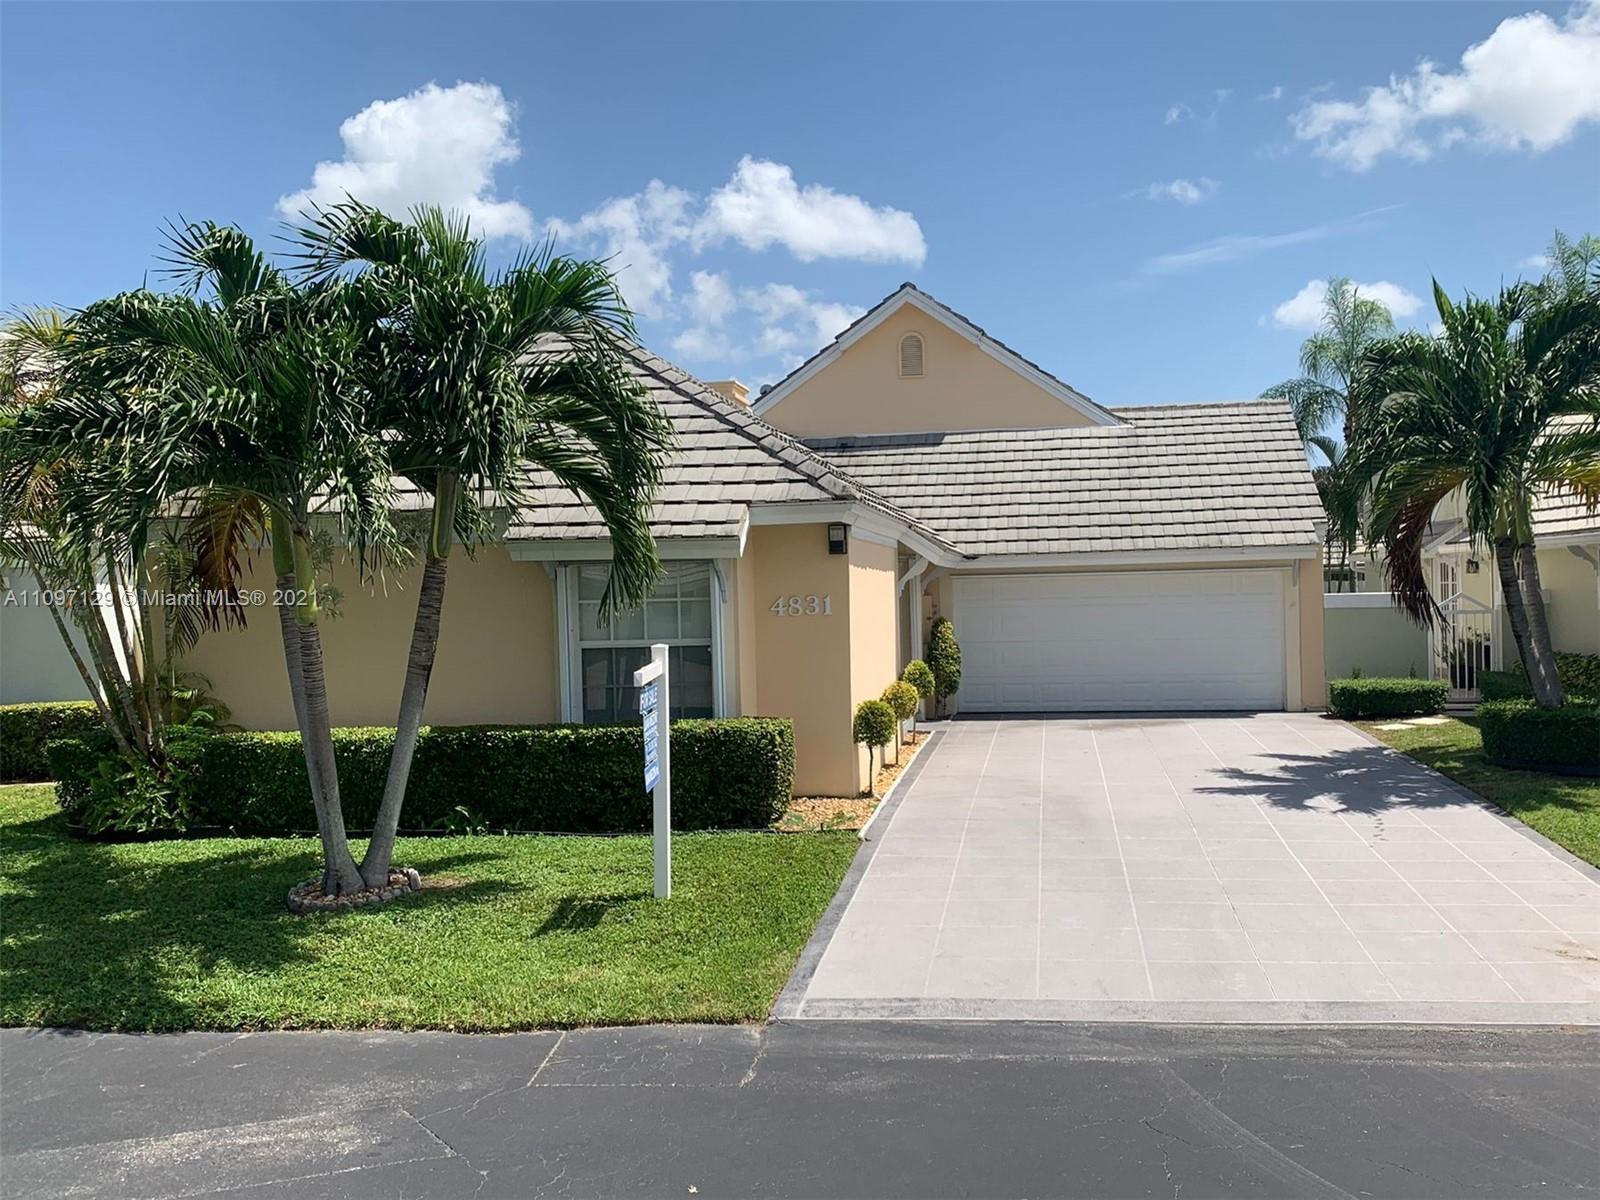 Doral Park - 4831 NW 99th Ct, Doral, FL 33178